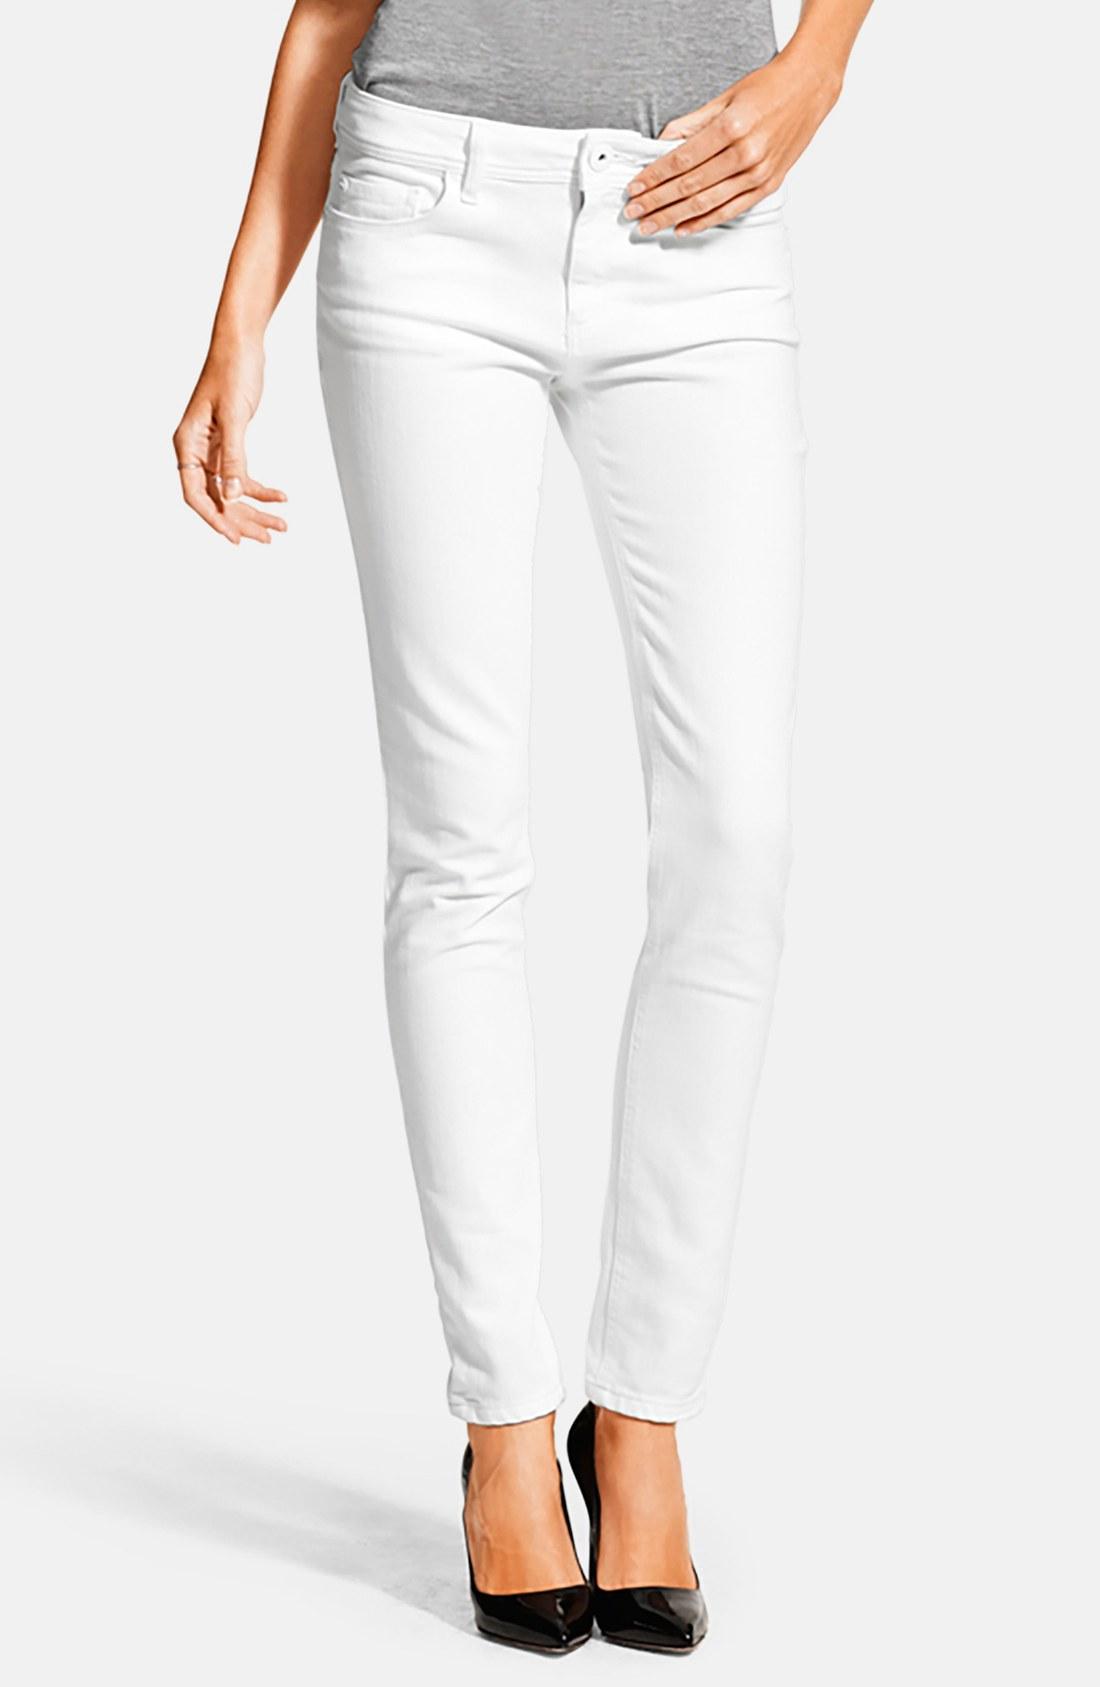 White jeans for females